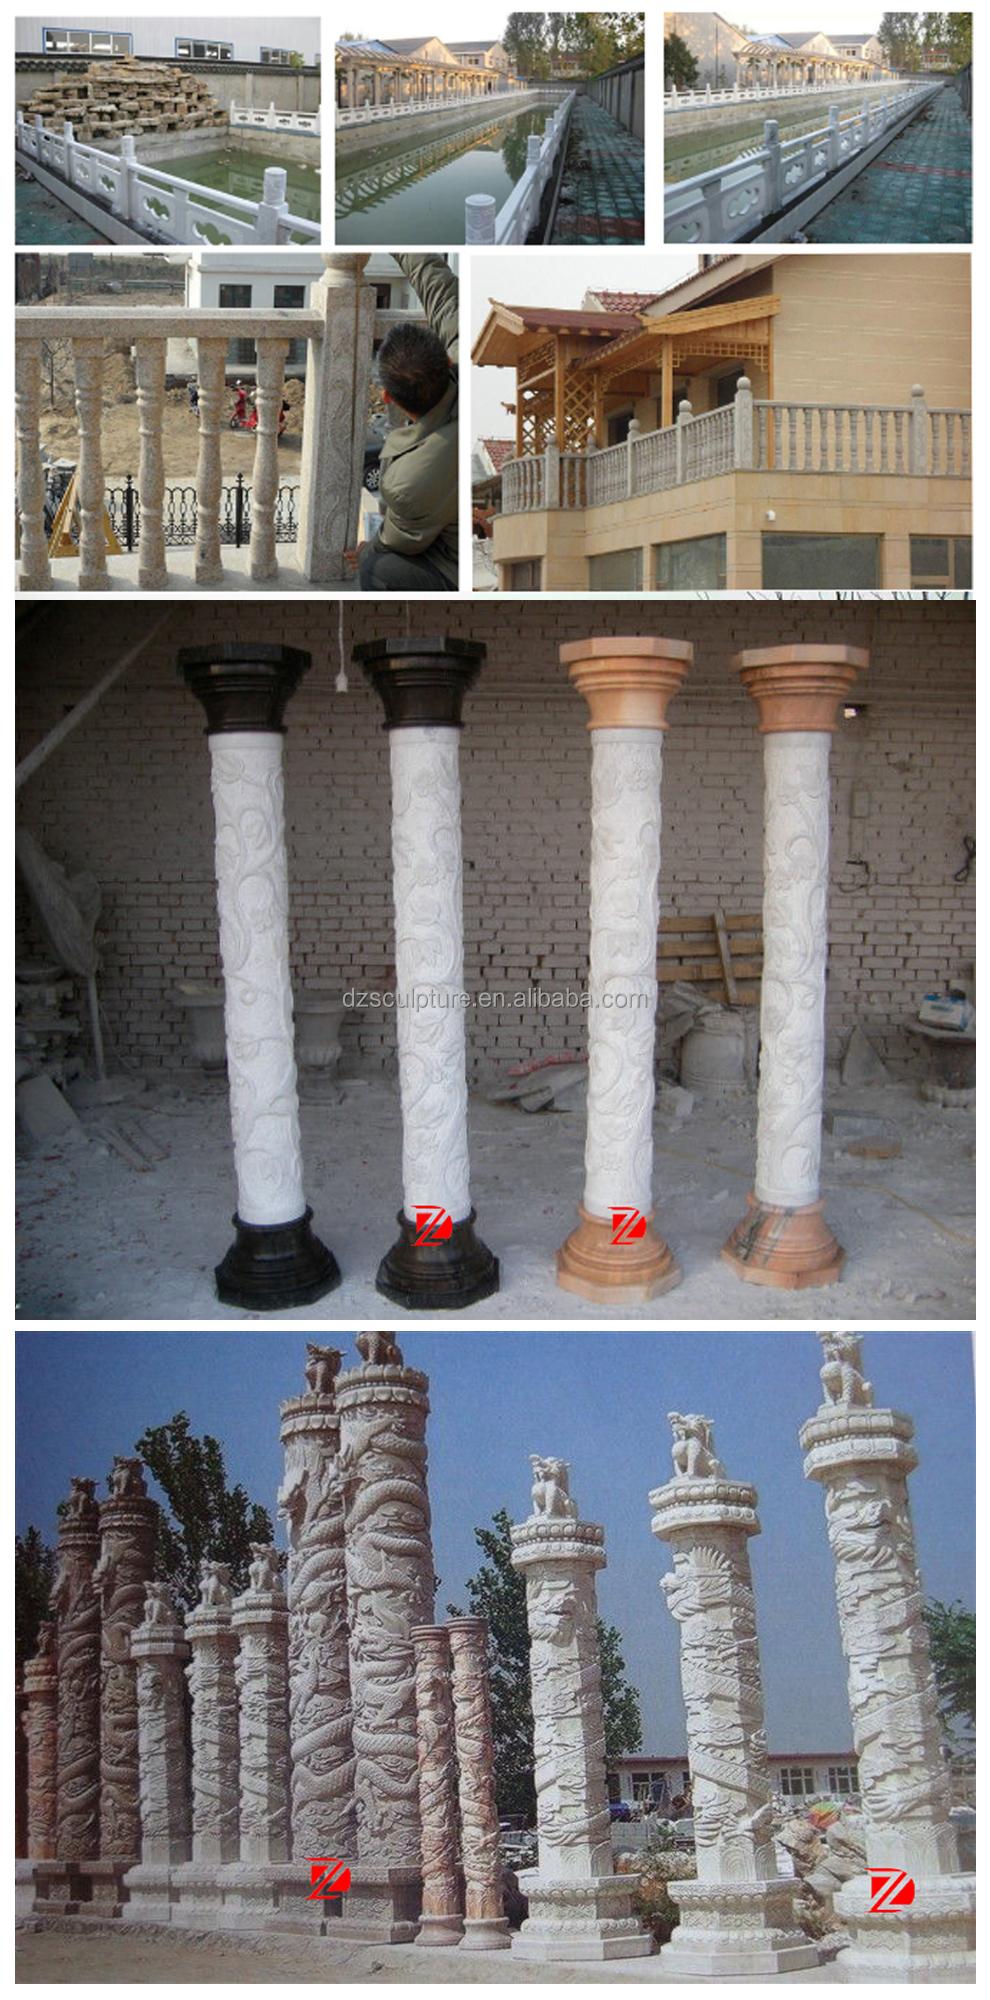 Building Columns For Sale Building Stone Columns For